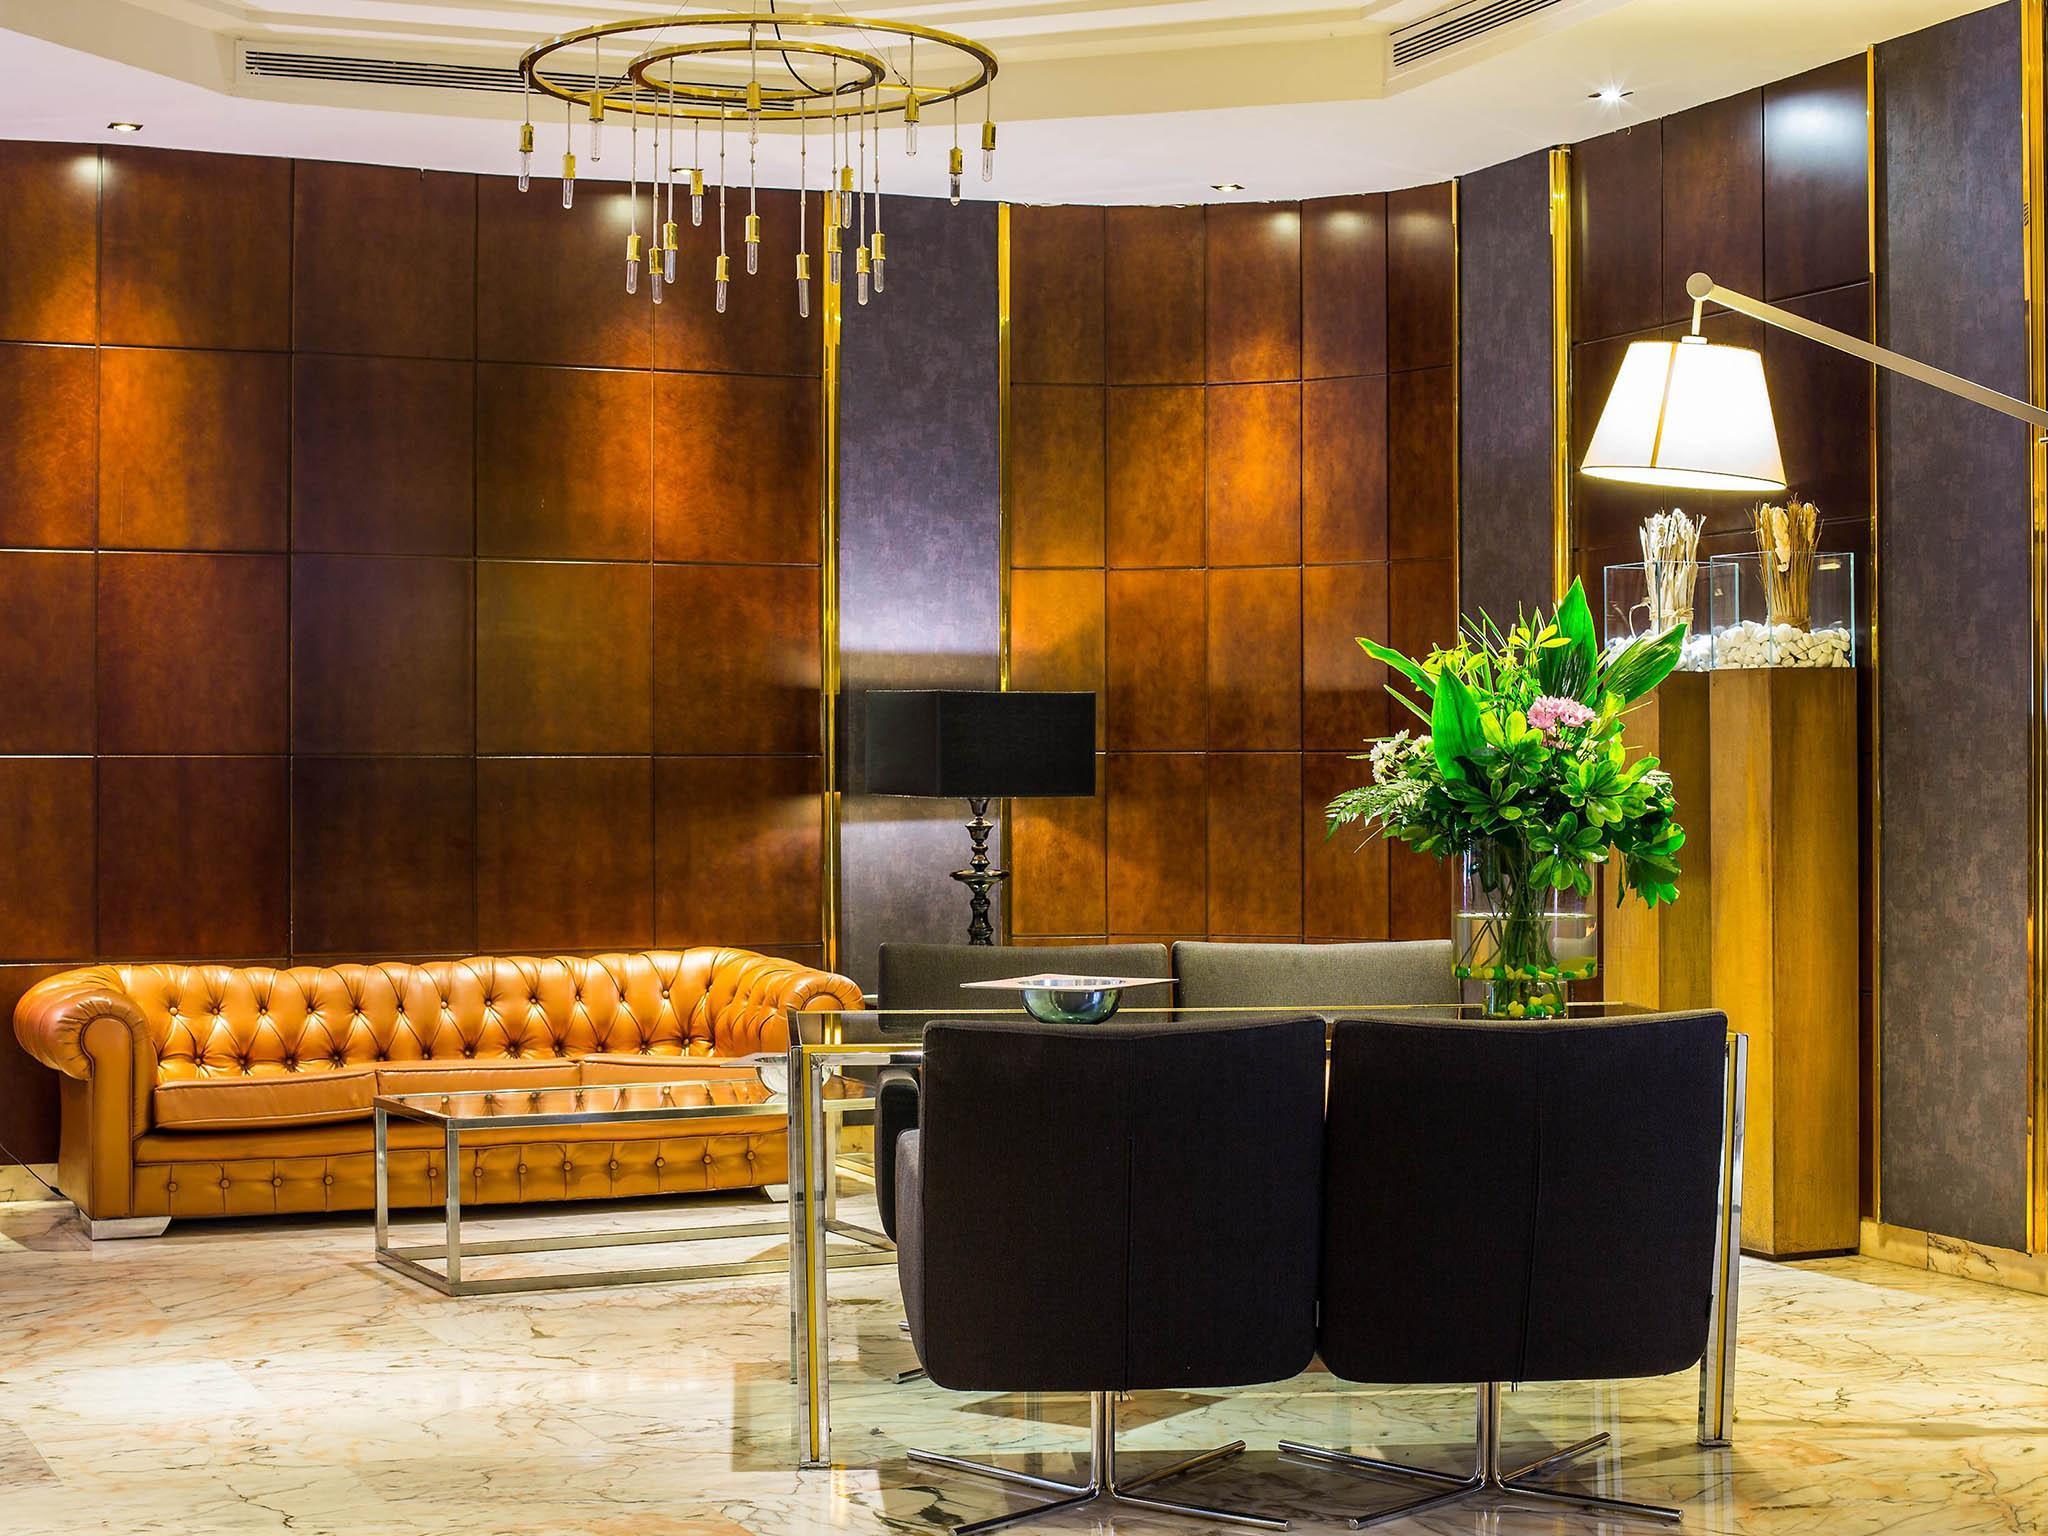 Hotel Carmen Granada Spain Excellent Hotel Carmen Granada Spain  # Muebles Bembibre